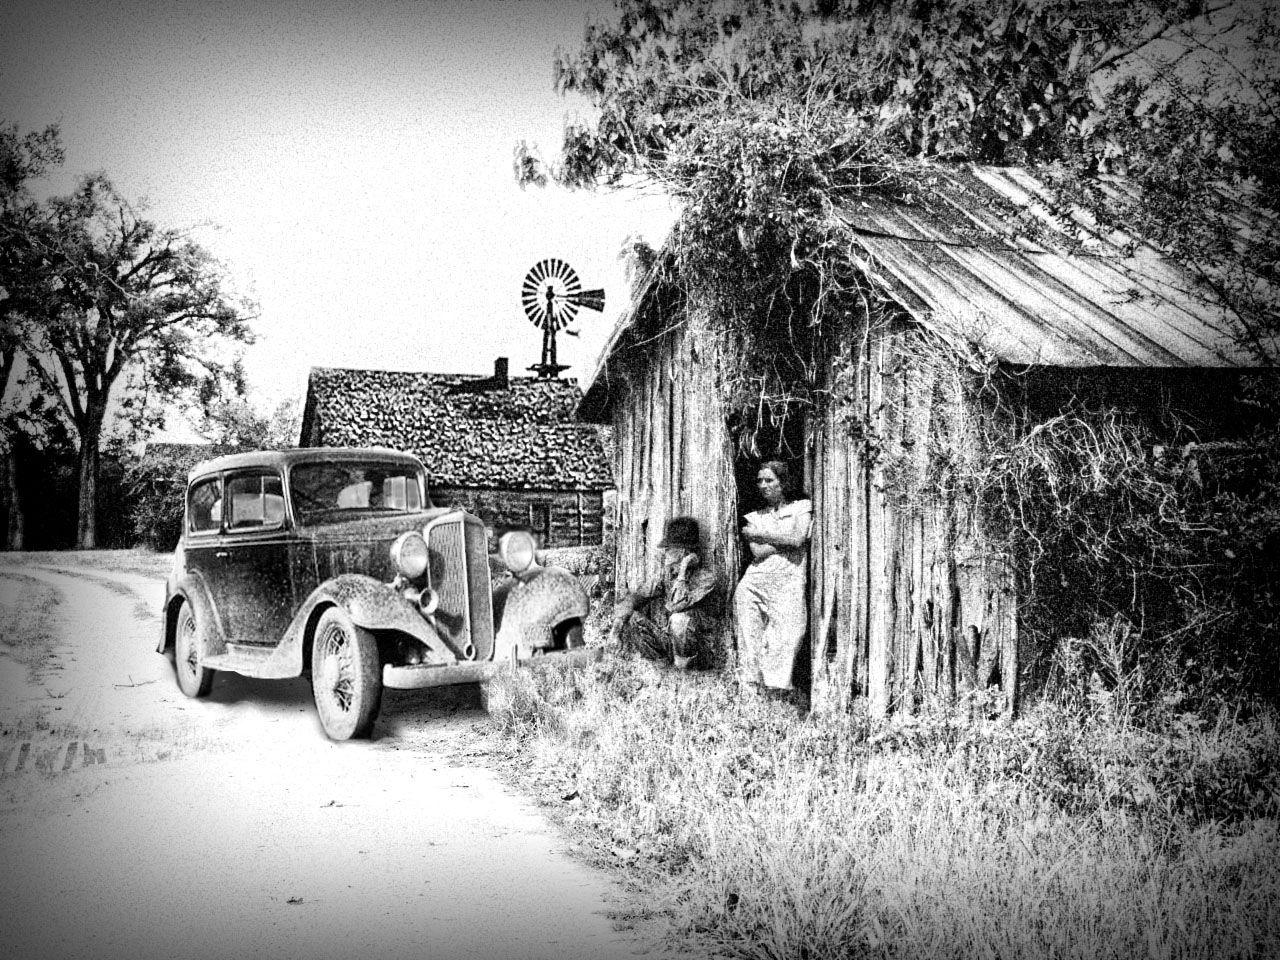 1930s mississippi Mississippi, 1930's Appalachia